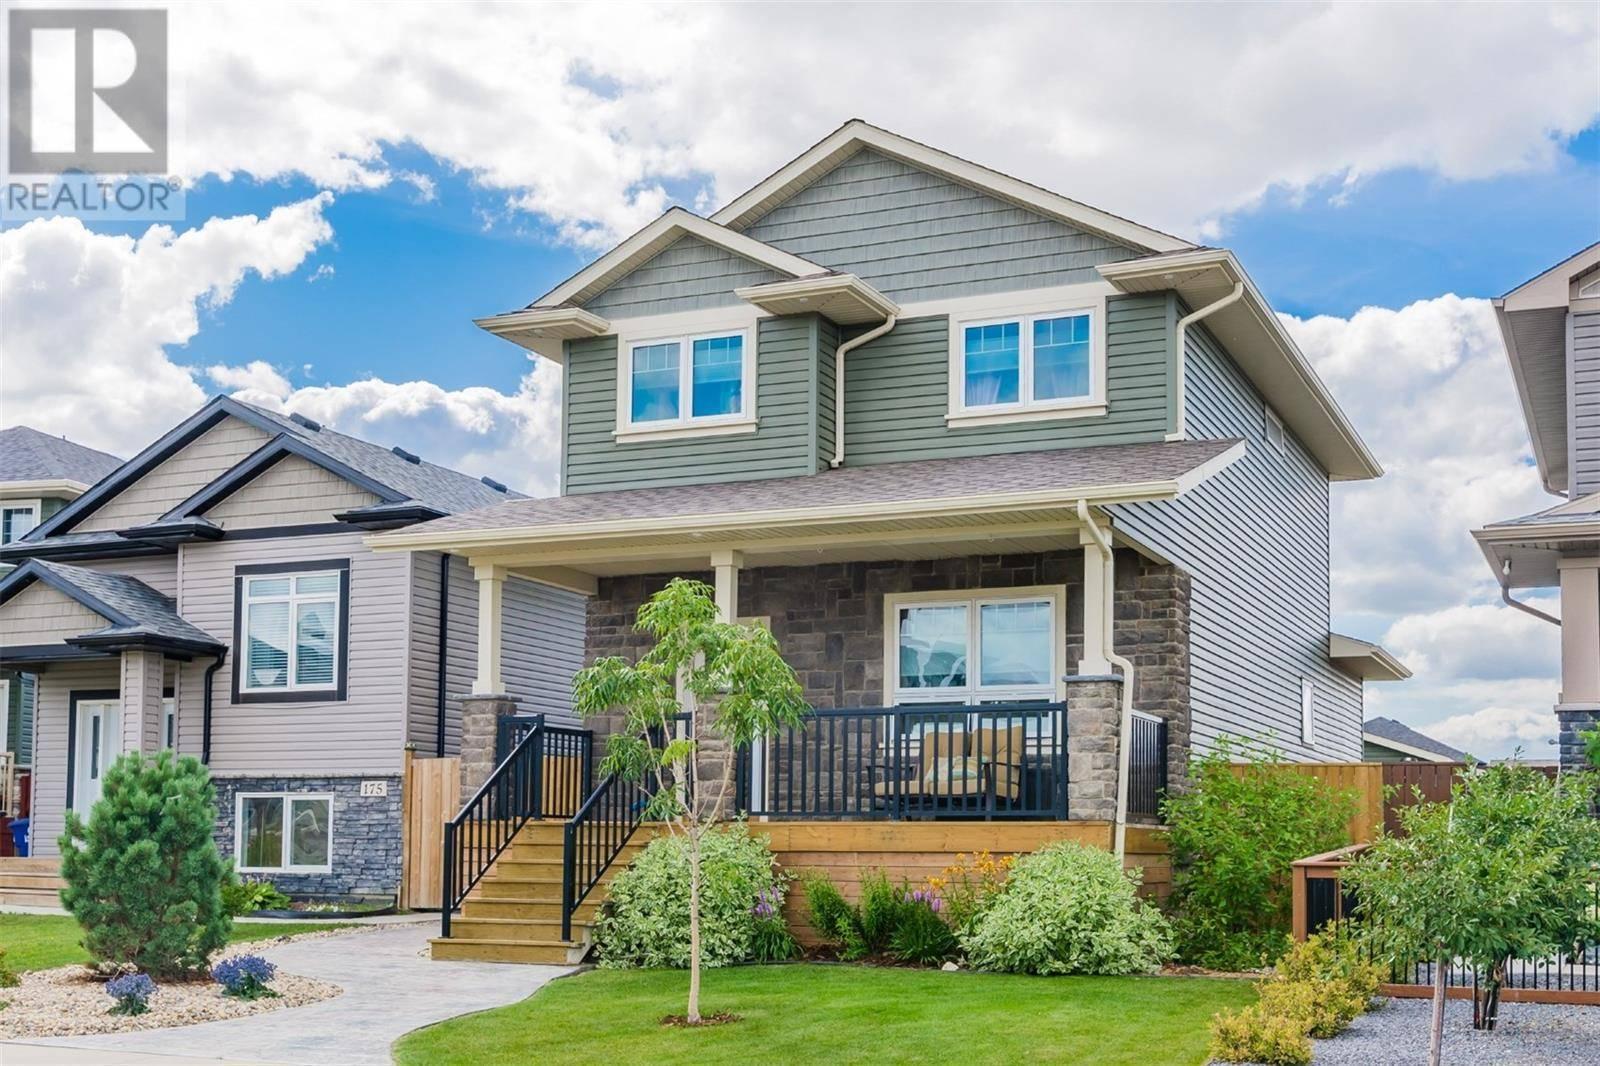 House for sale at 171 Maningas Bnd  Saskatoon Saskatchewan - MLS: SK783477